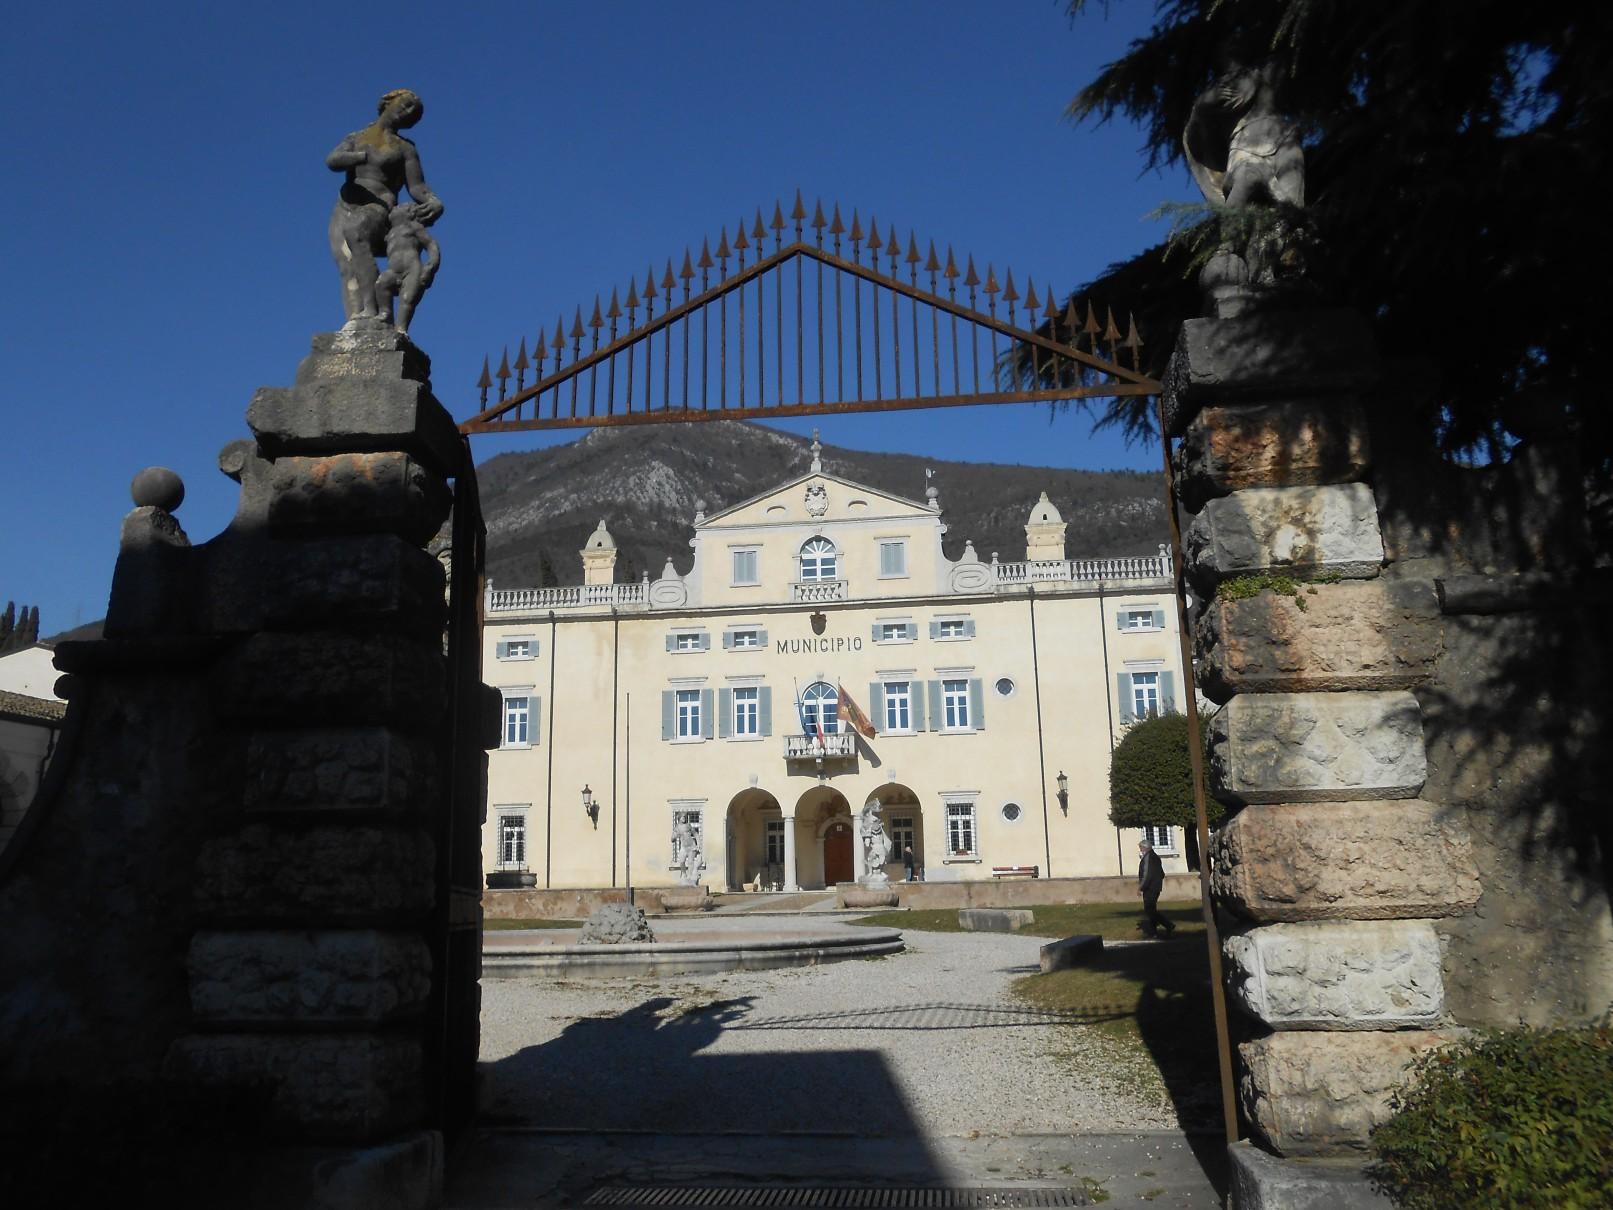 comune, Caprino Veronese